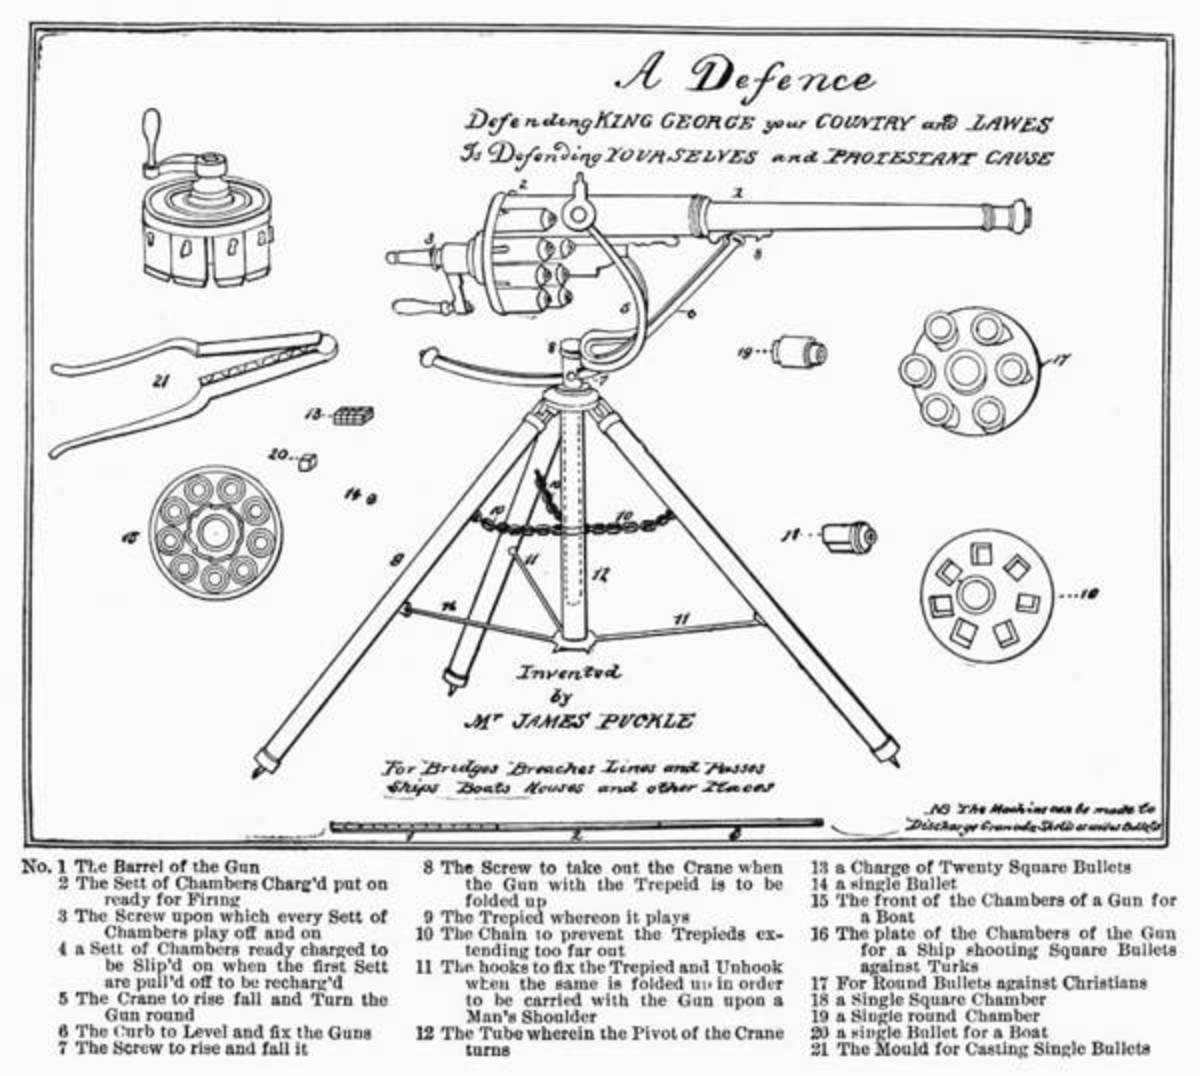 Patent drawing of Puckle Gun